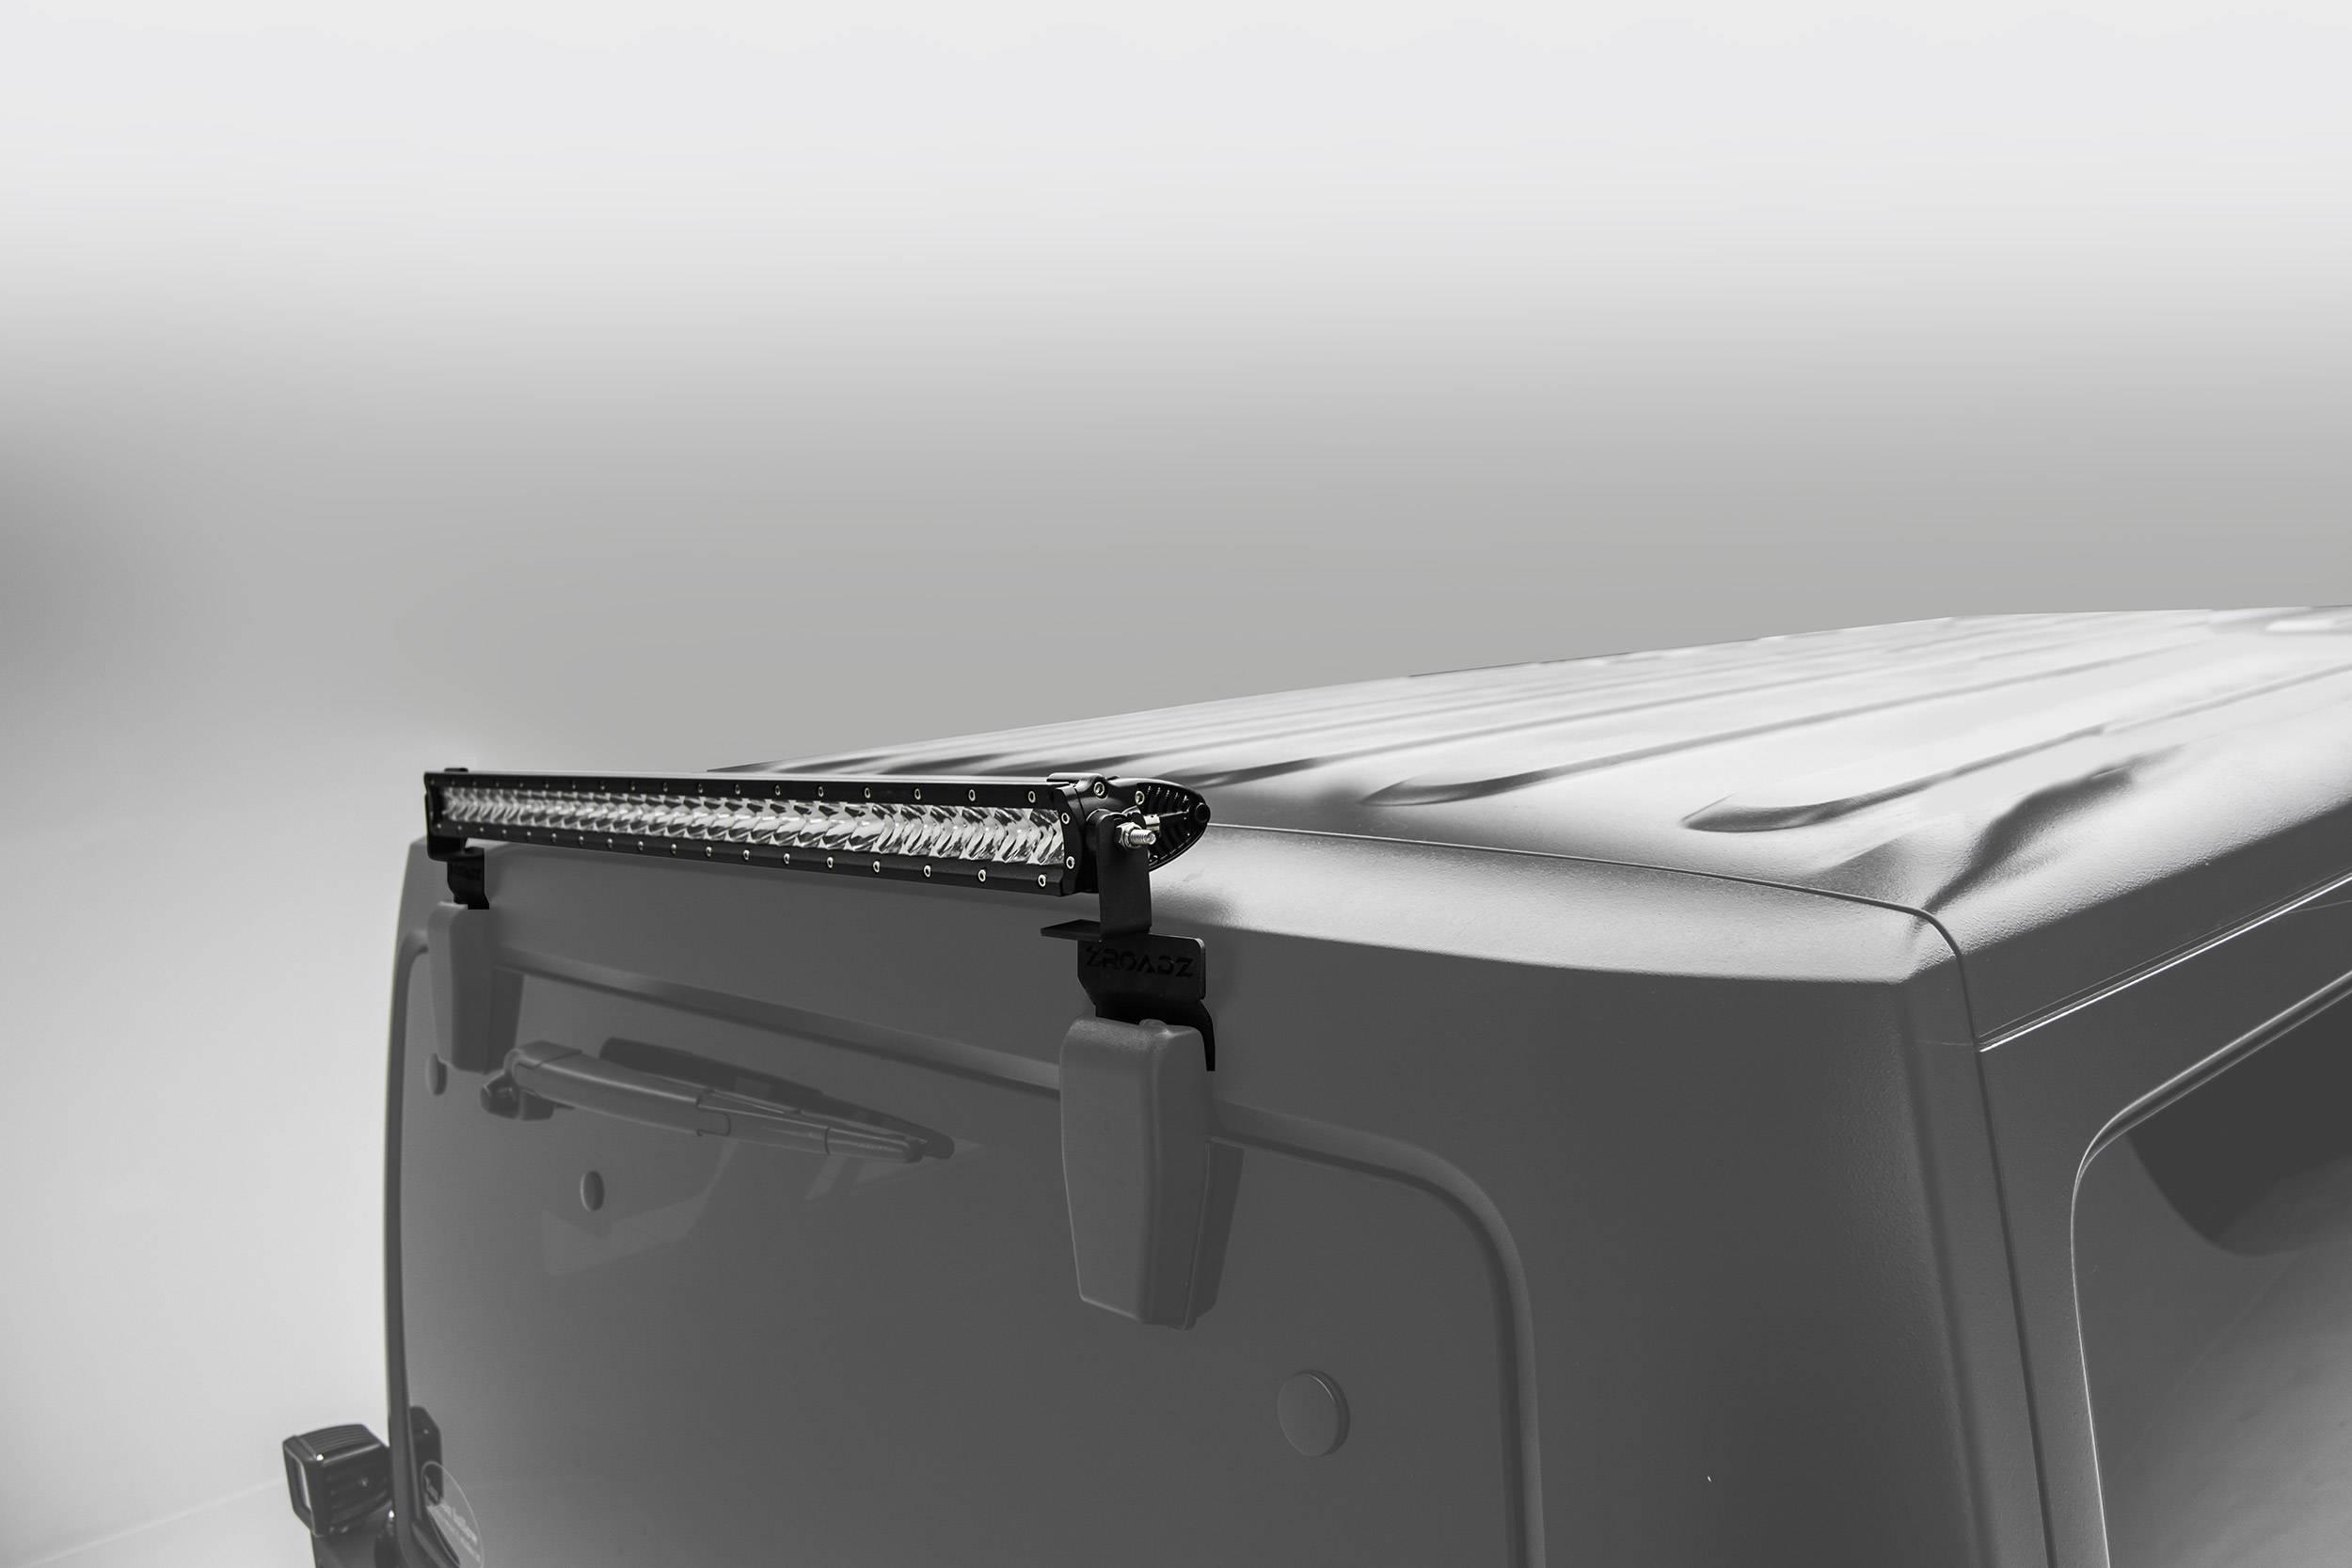 ZROADZ                                             - 2007-2018 Jeep JK Rear Window LED Bracket to mount (1) 30 Inch Staight Single Row LED Light Bar - PN #Z394811